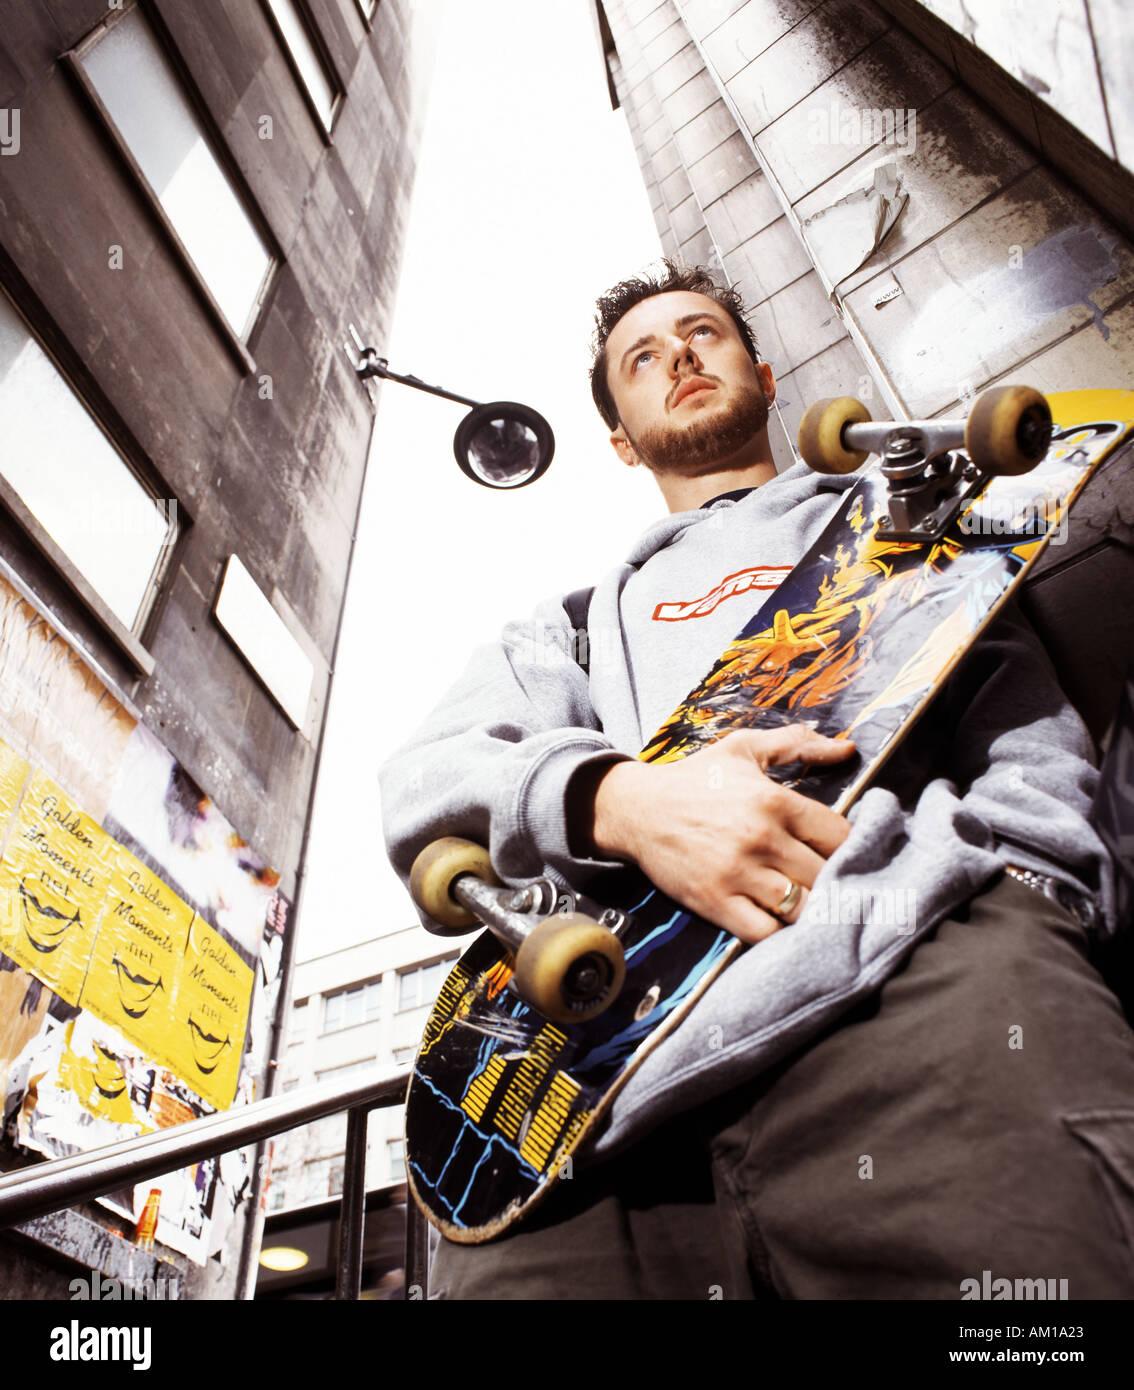 skateboarder holding board posing - Stock Image